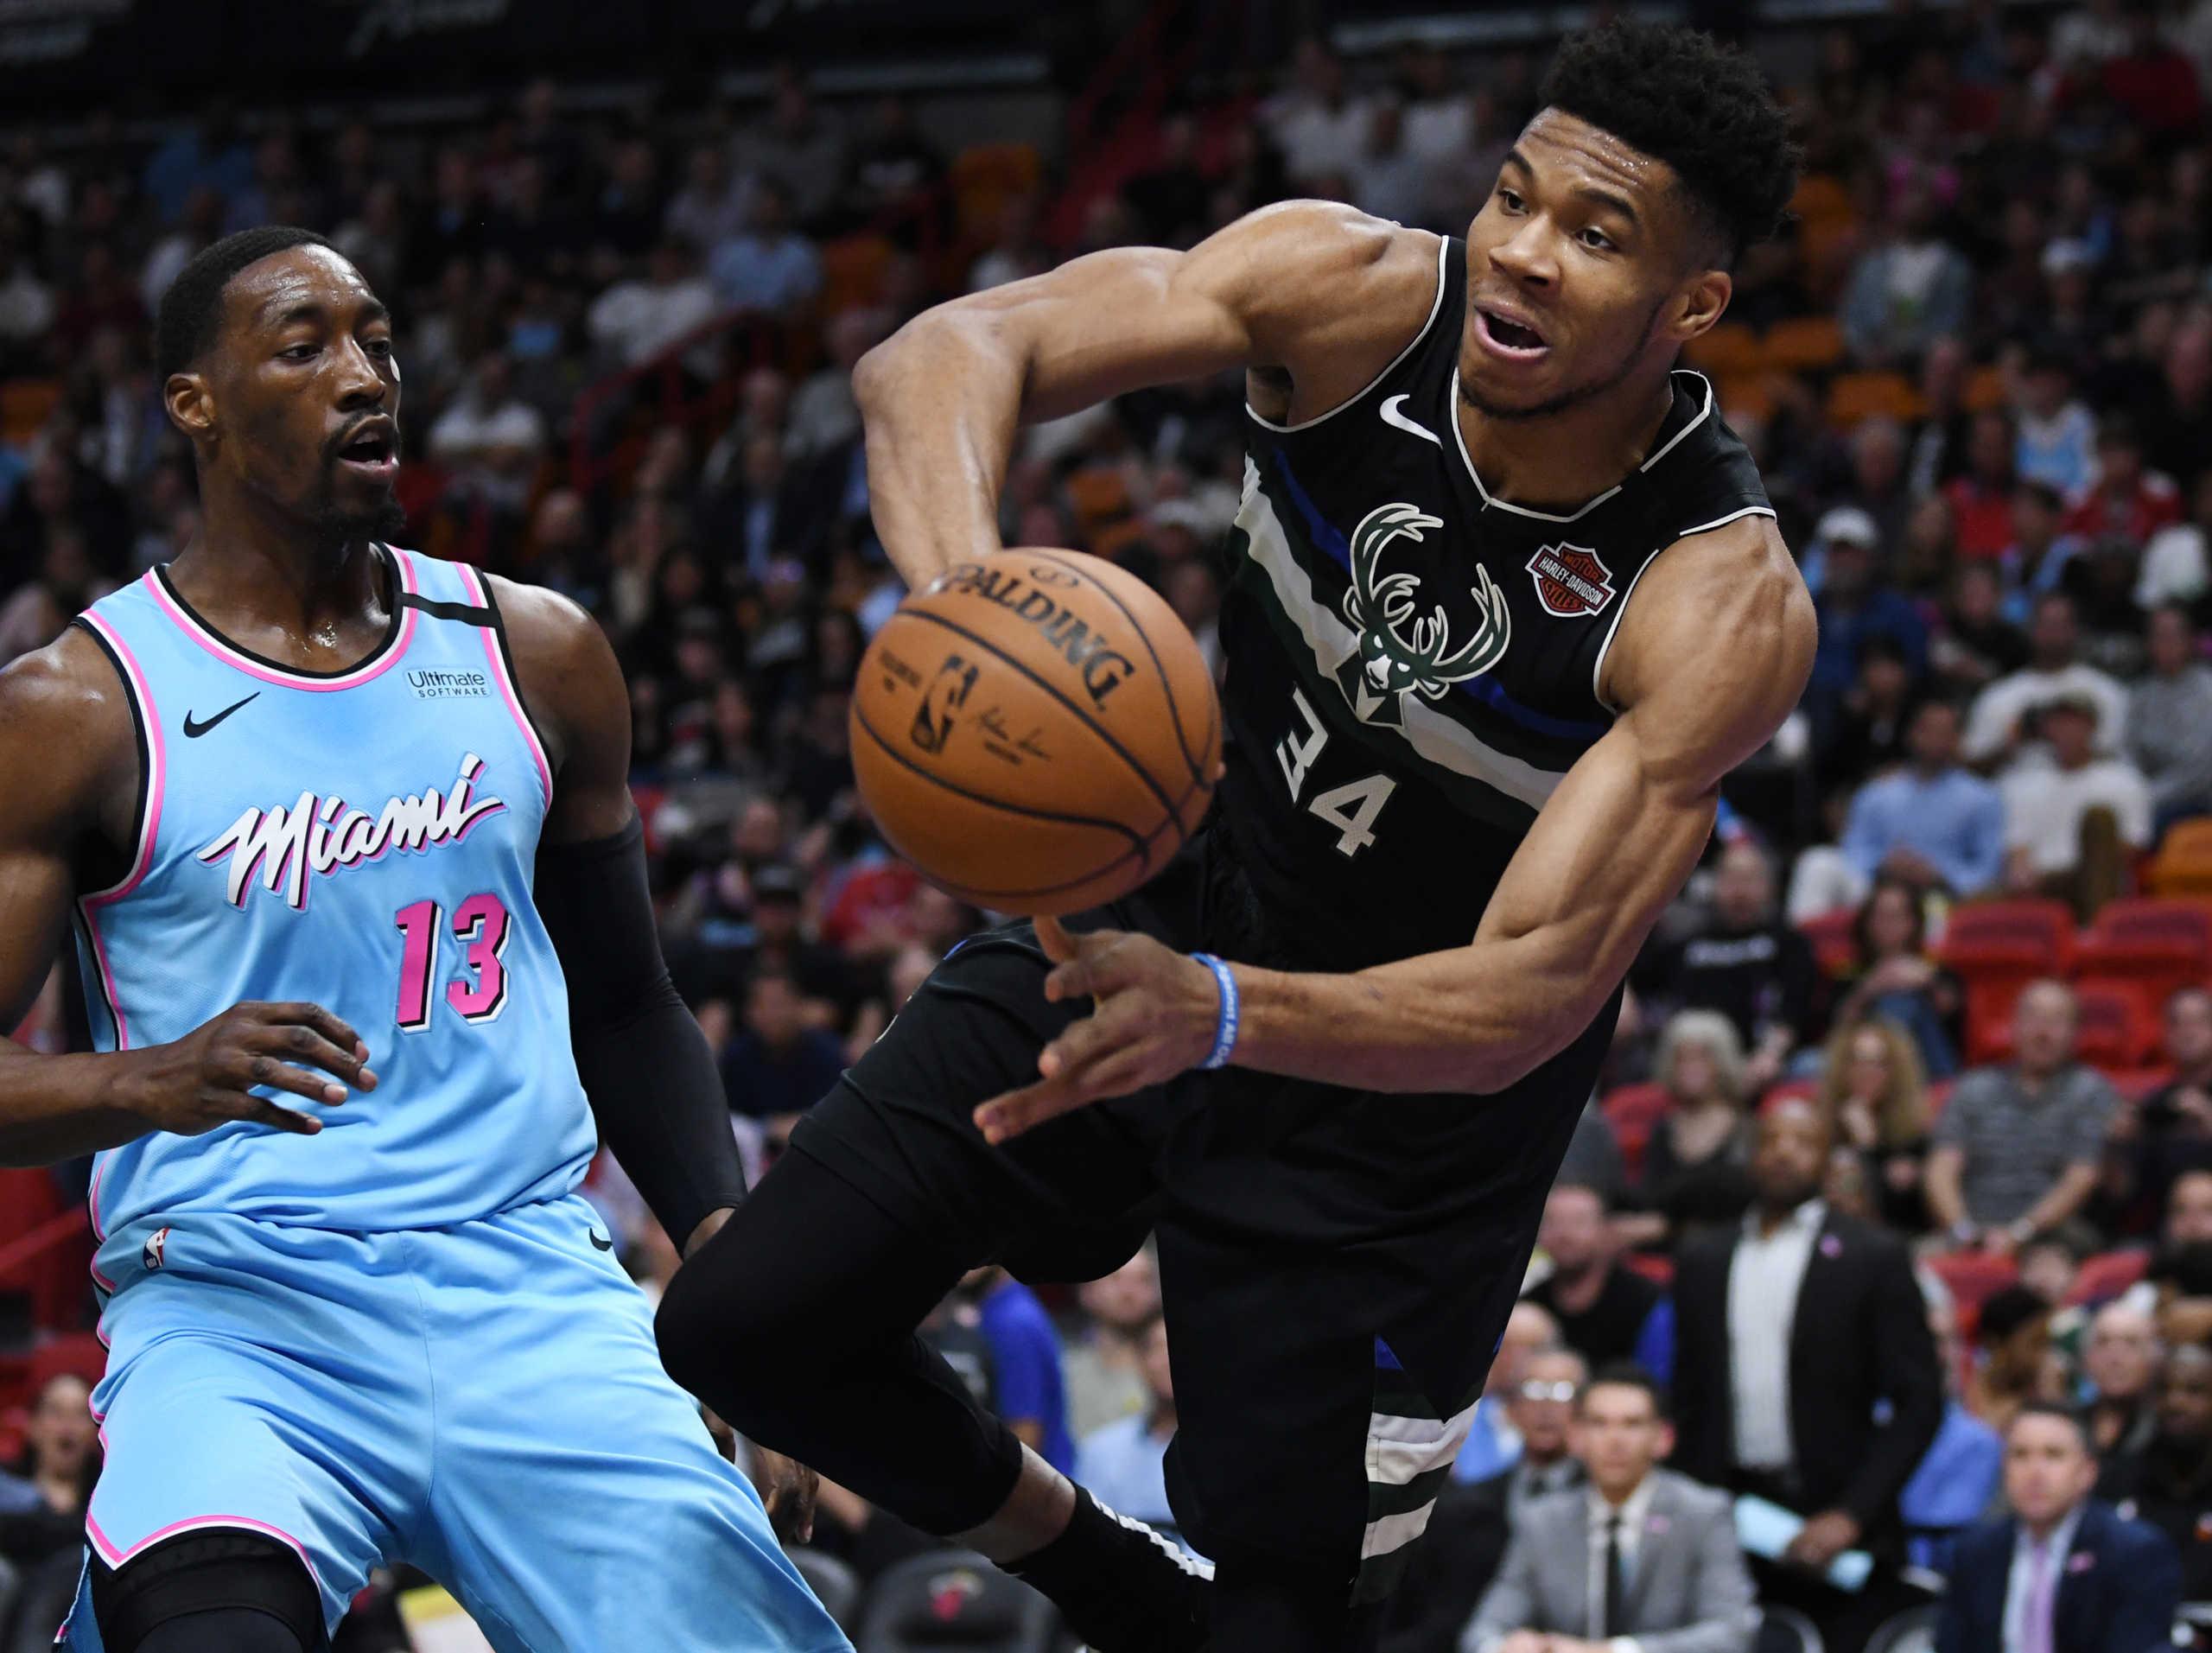 NBA: Επίσημο! Υπέγραψε supermax συμβόλαιο με τους Χιτ ο Αντεμπάγιο (pic)